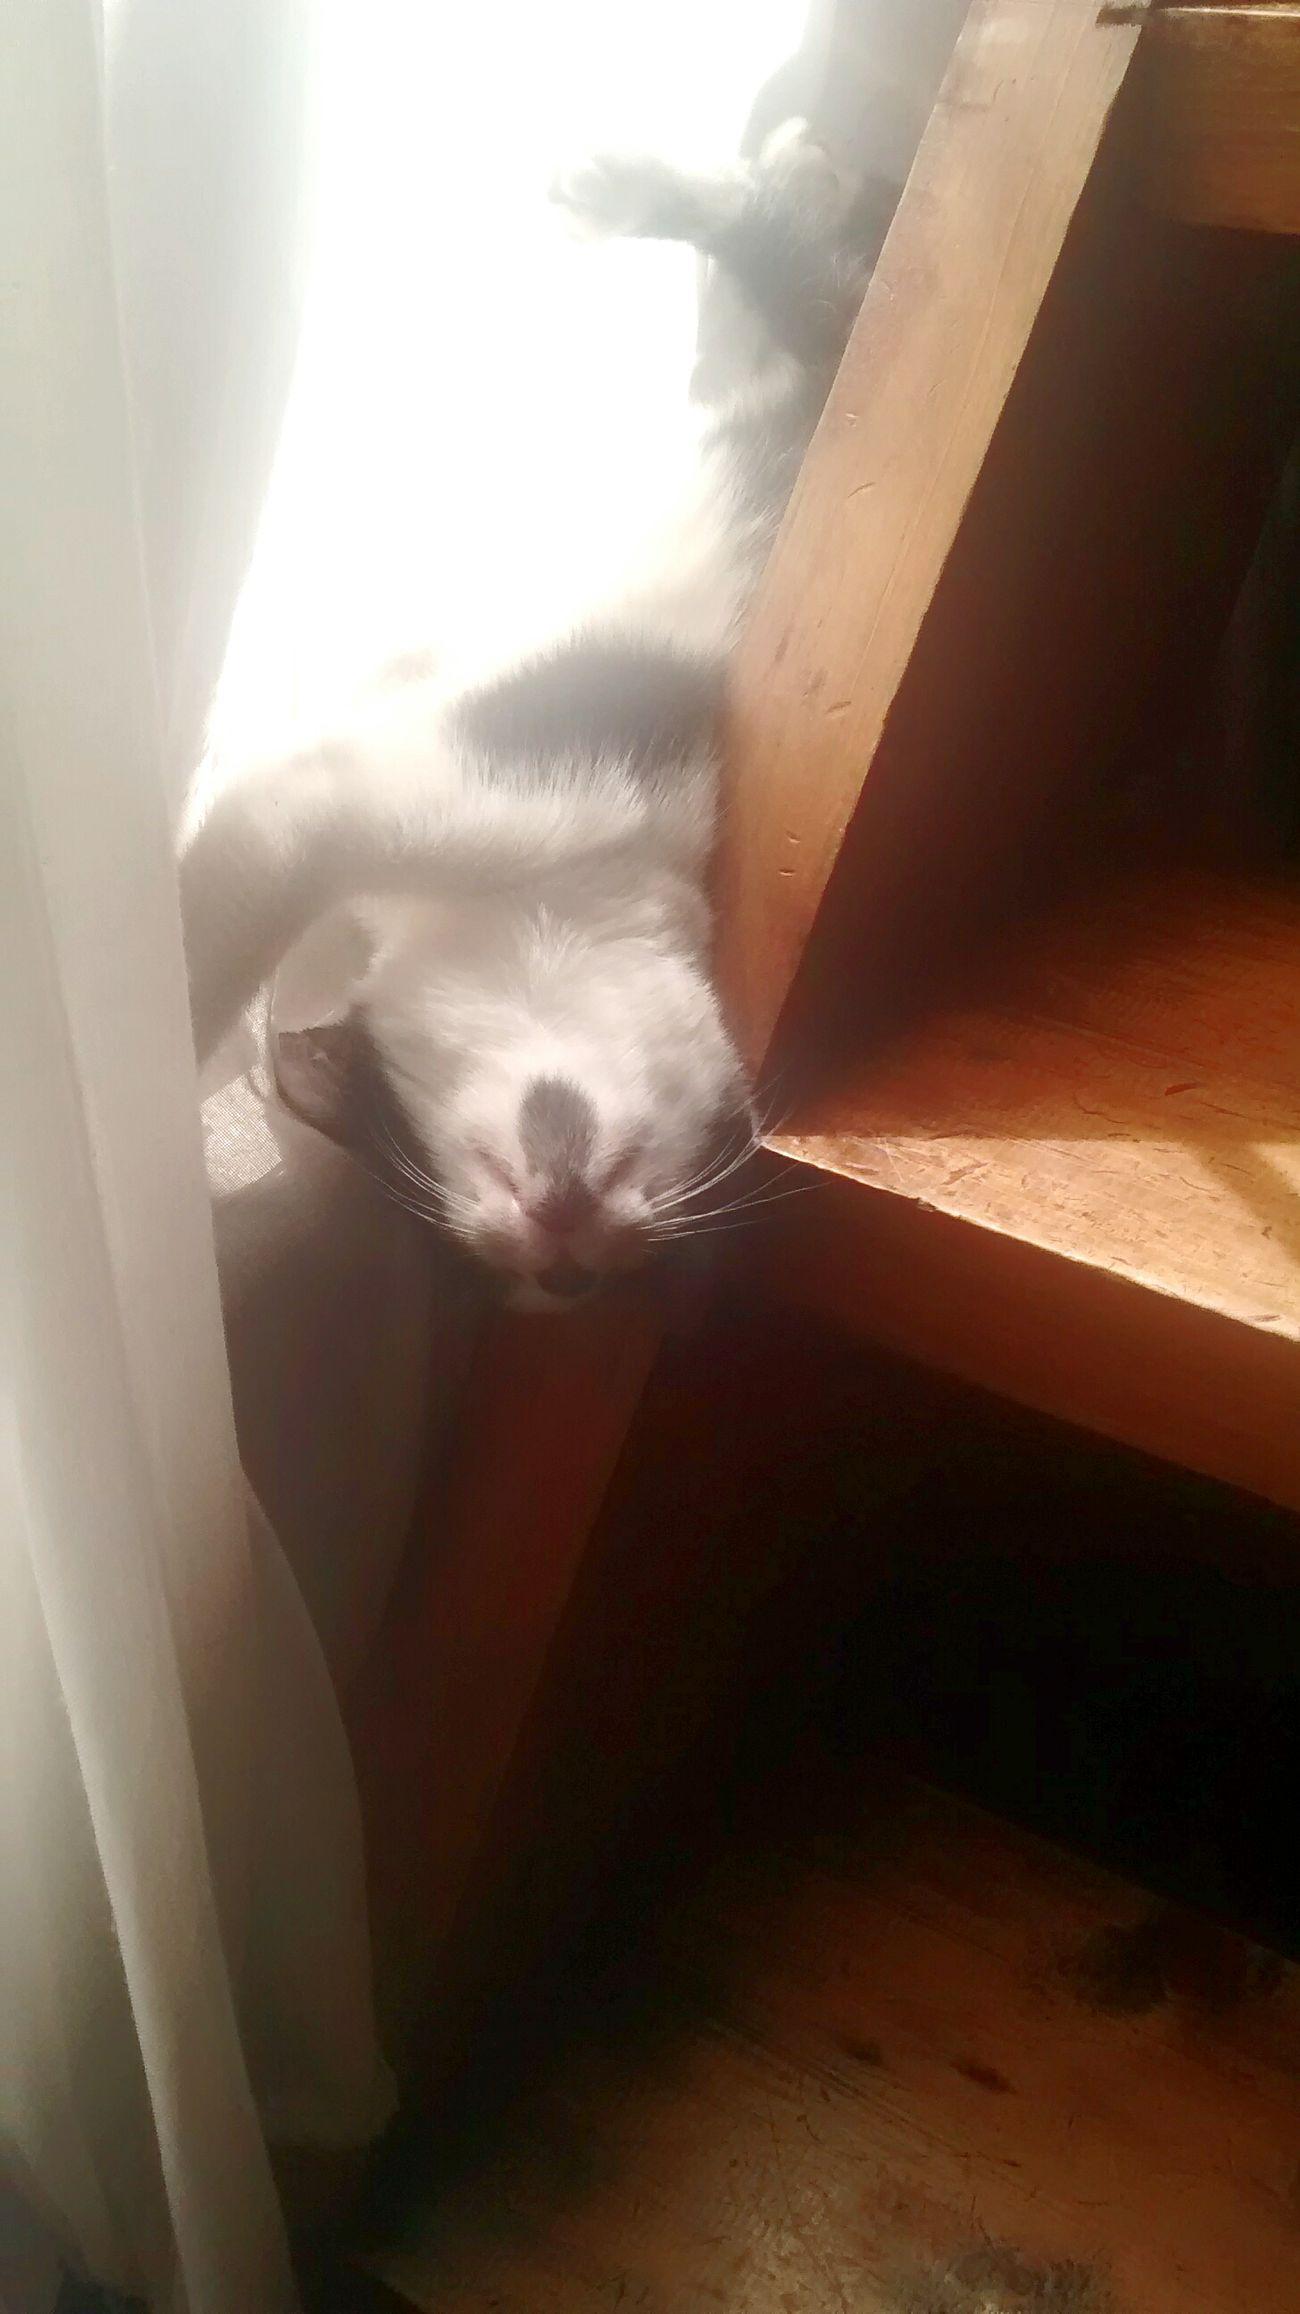 Gatita 😸 Cat♡ Gatita  Foto Check This Out Hello World Dia Extraña Hi! Ilike Gatuna FotoDelDia First Eyeem Photo Fotografia Chile♥ Myfriend